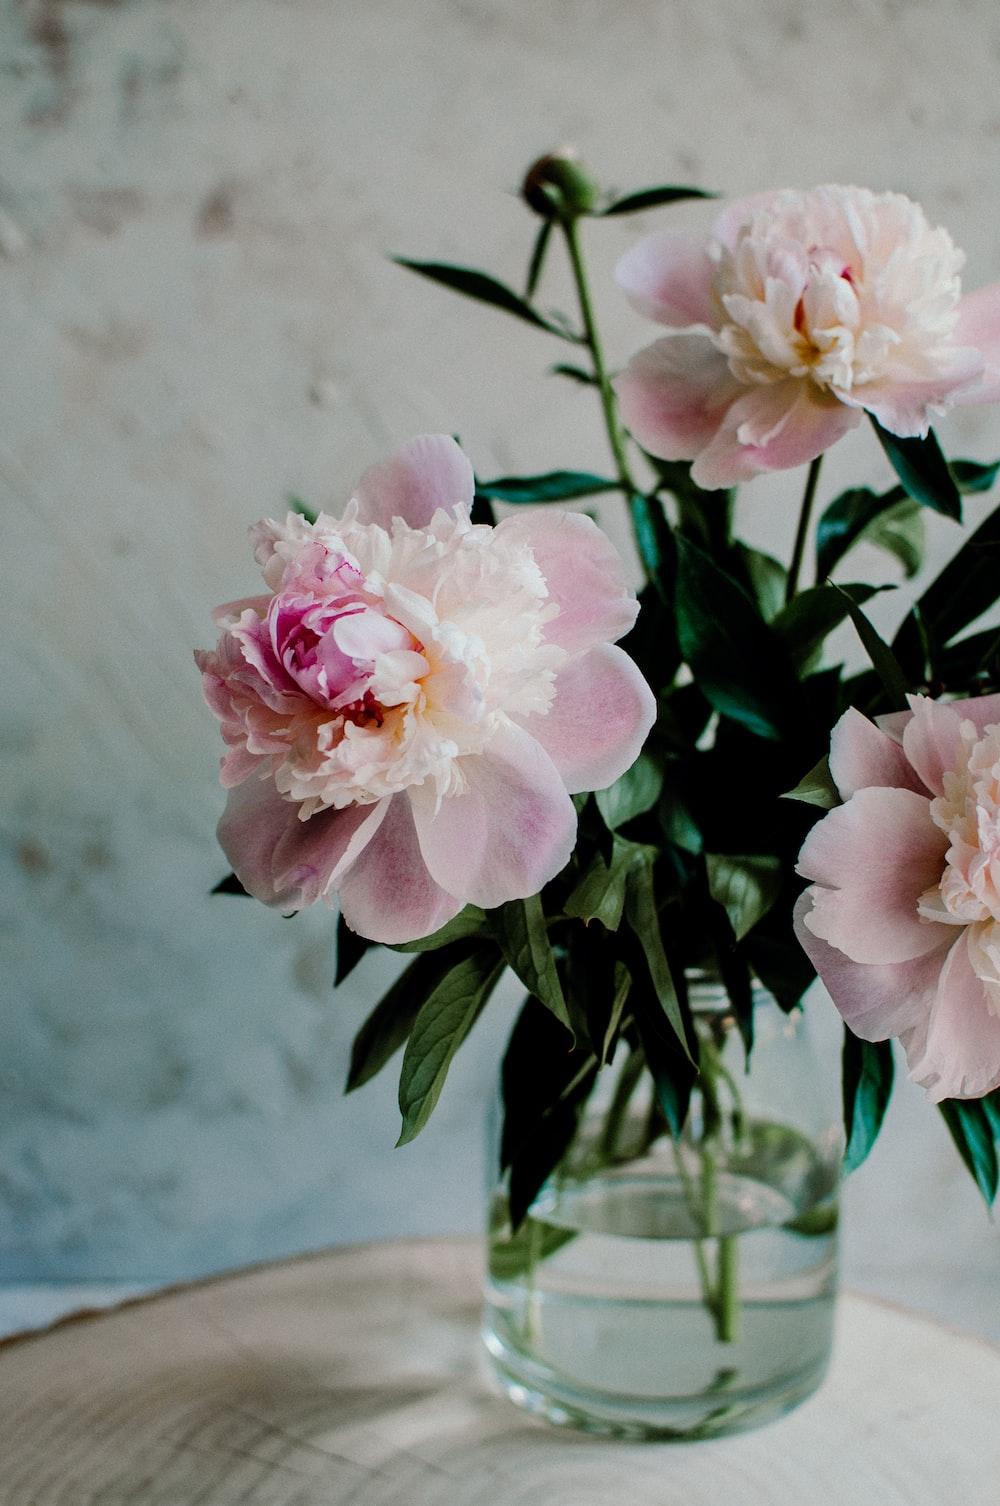 Vintage Flowers Pictures Download Free Images On Unsplash